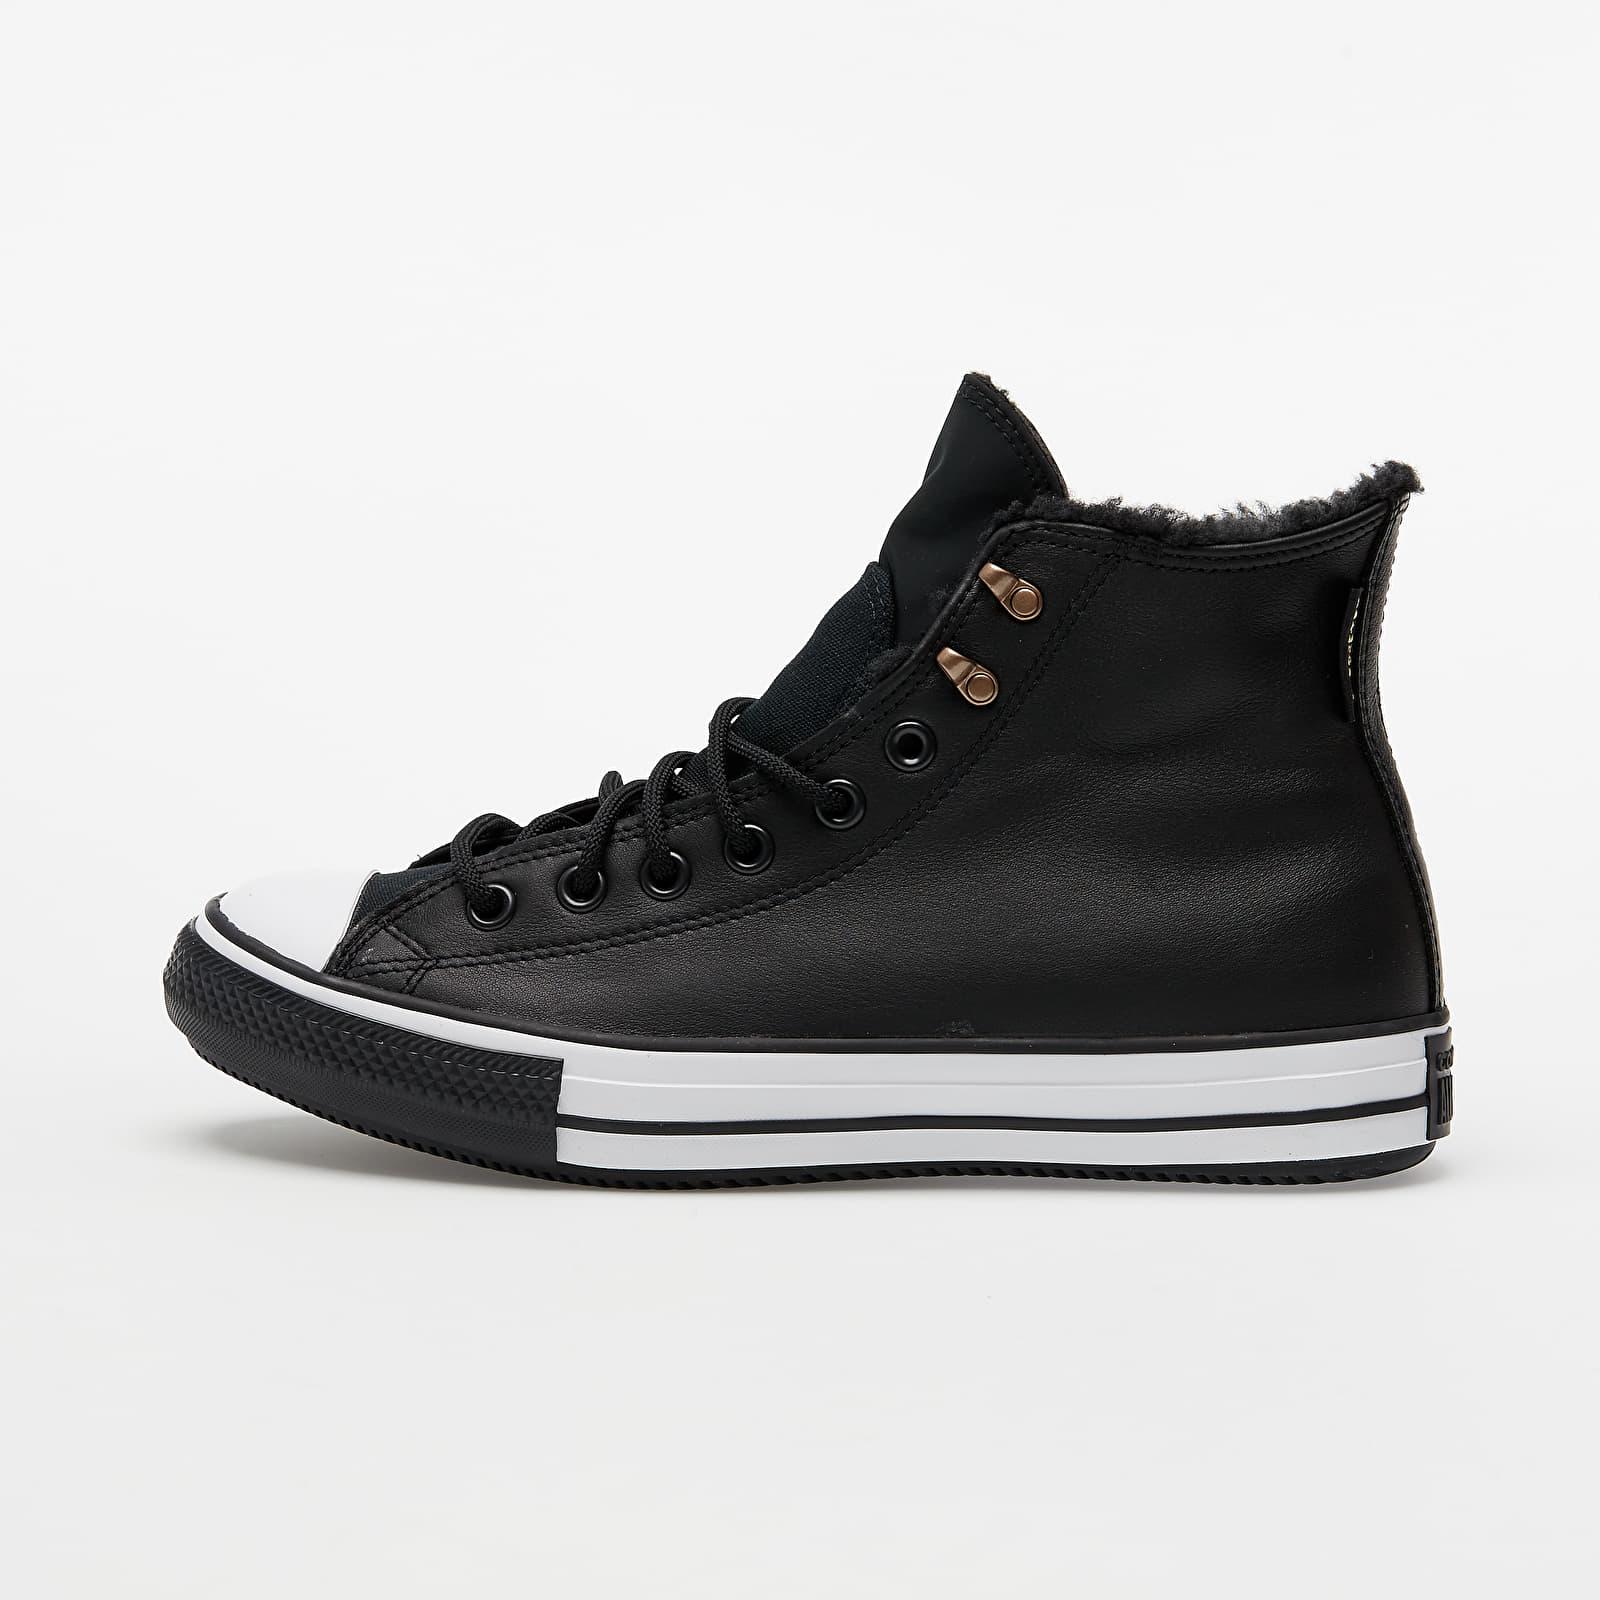 Men's shoes Converse Chuck Taylor All Star Winter Hi Black/ Black/ White